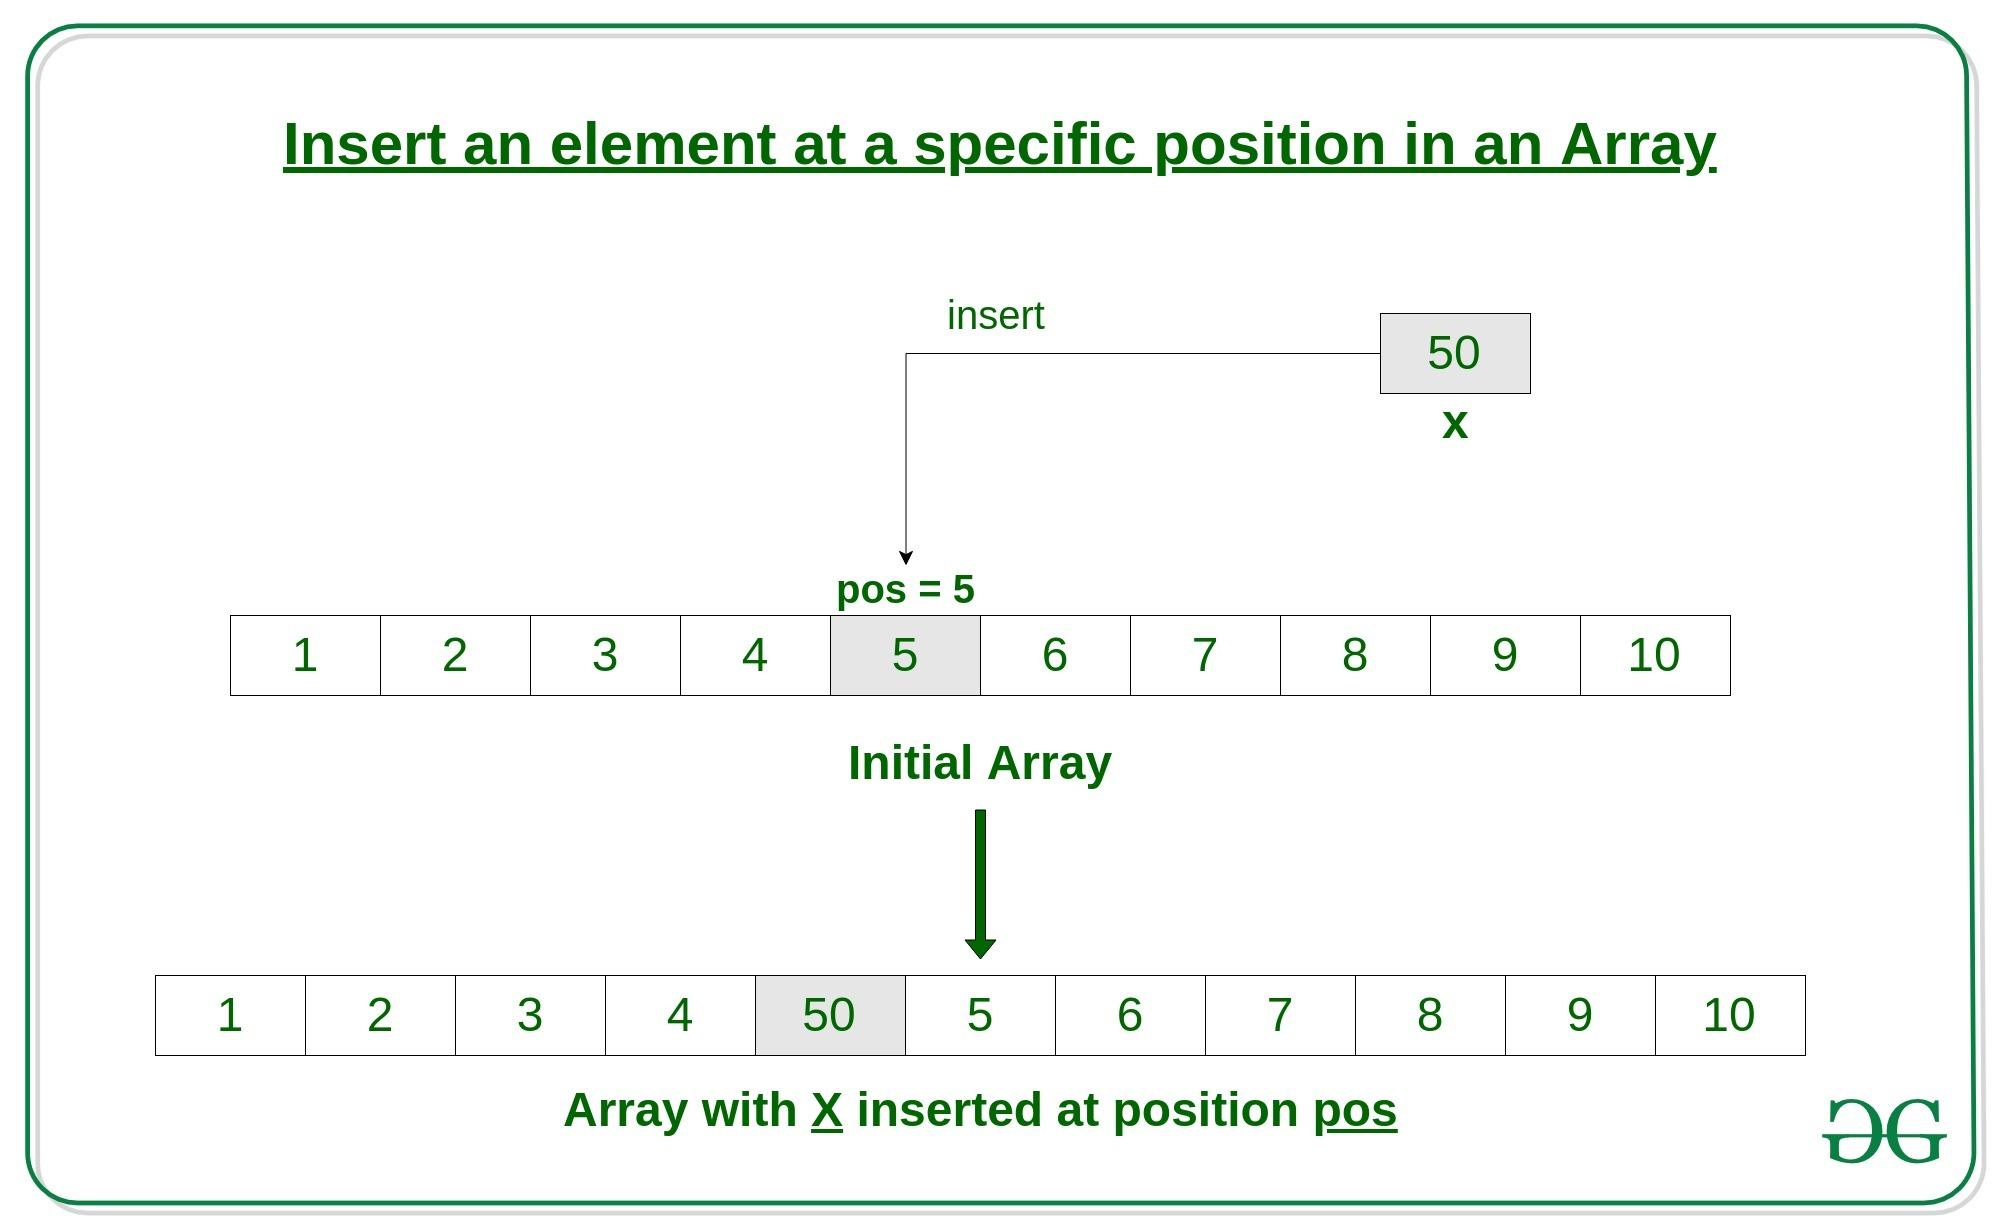 C program to Insert an element in an Array - GeeksforGeeks